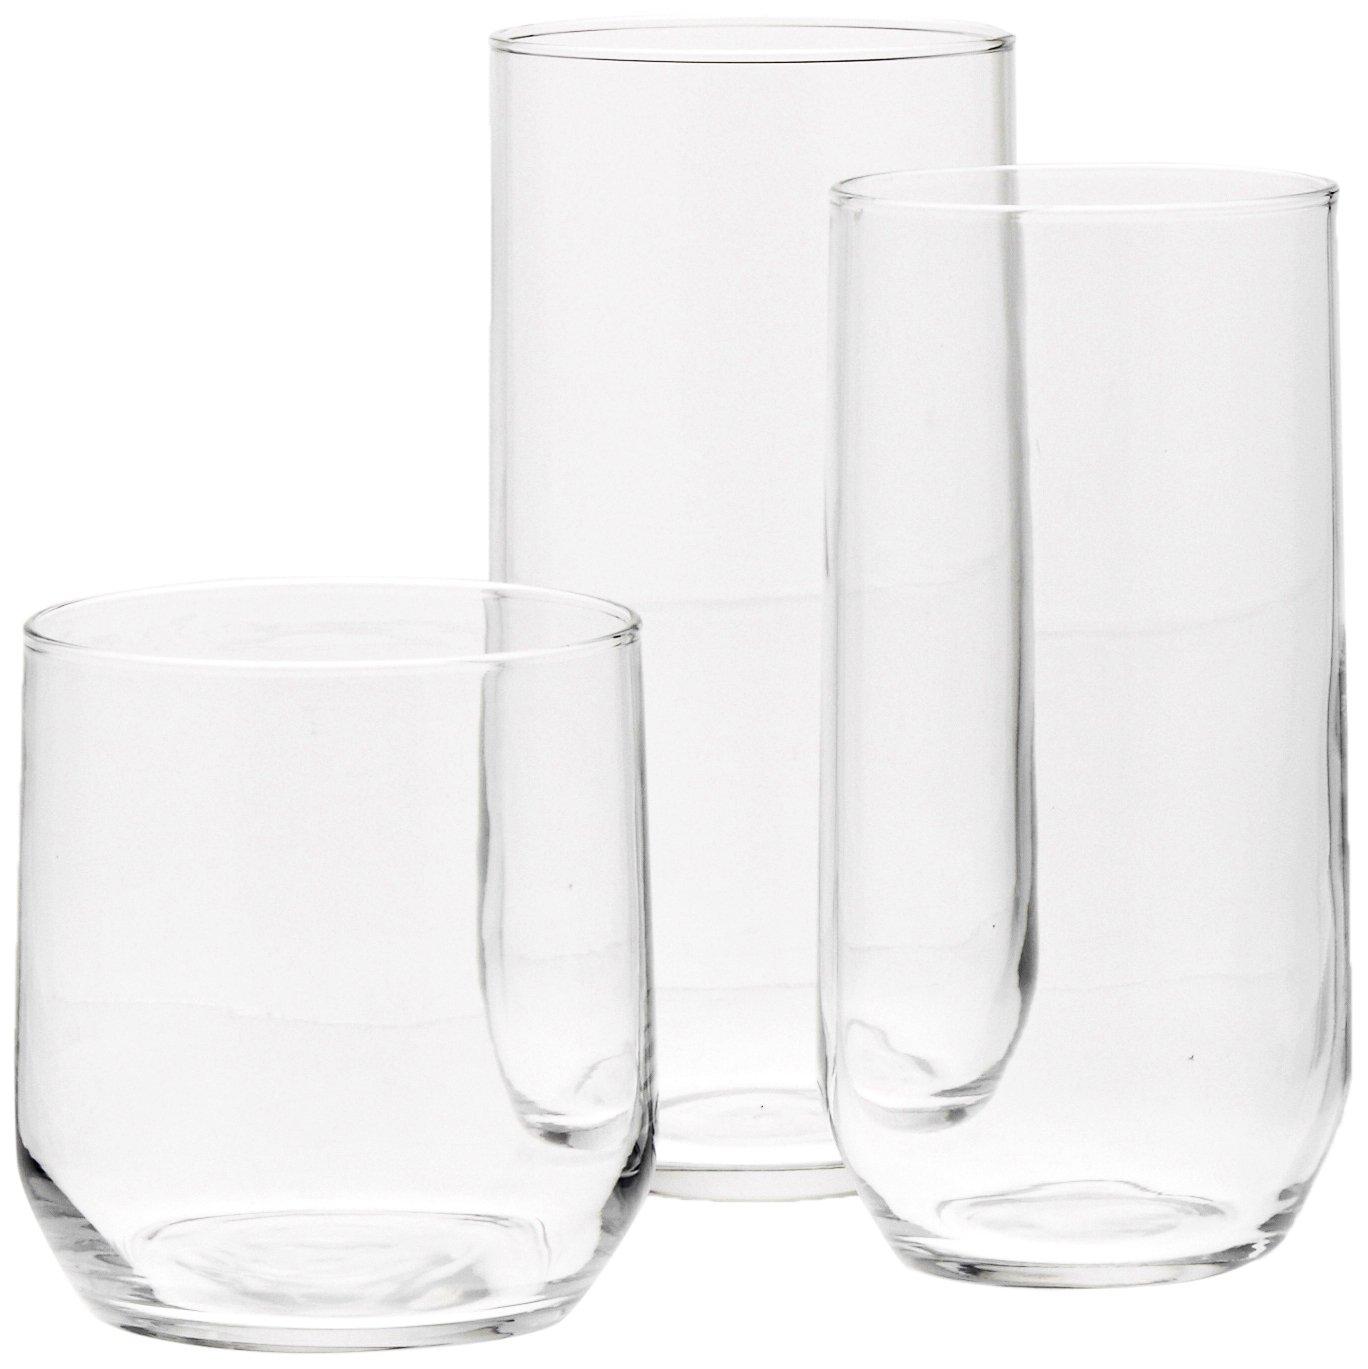 AmazonBasics 18-Piece Glassware Set N4038